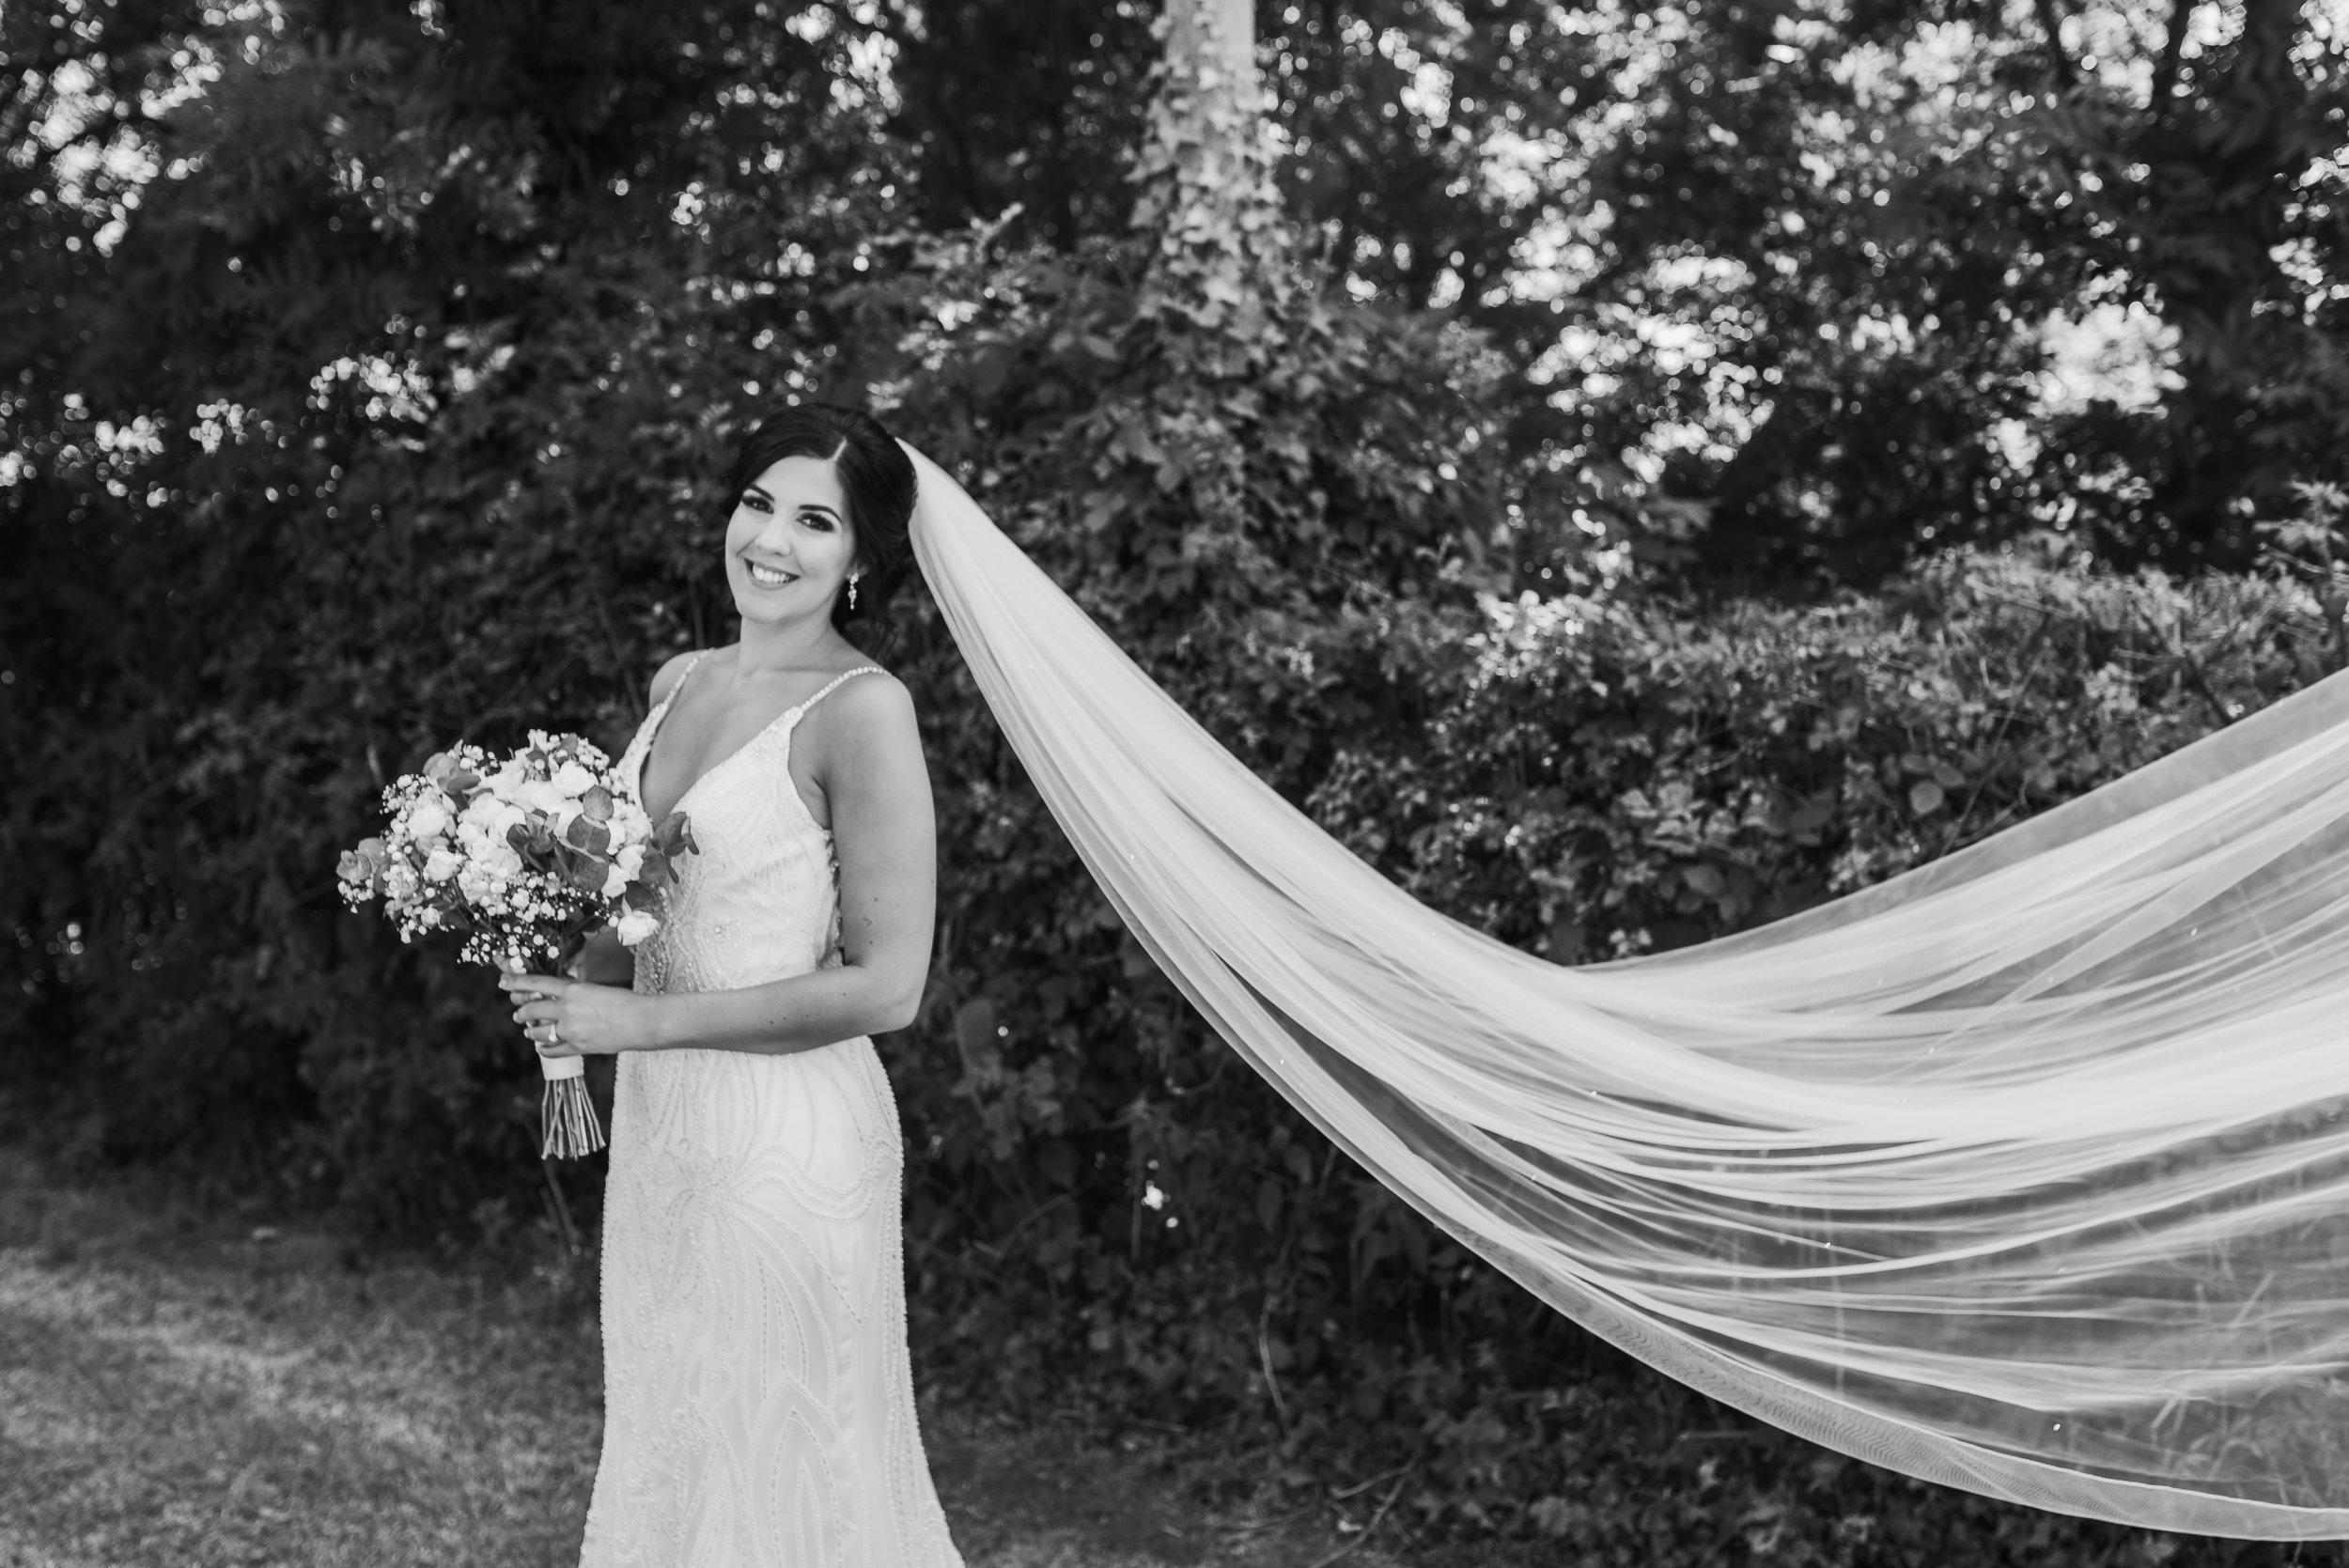 Oxfordshire-wedding-photographer-47.jpg